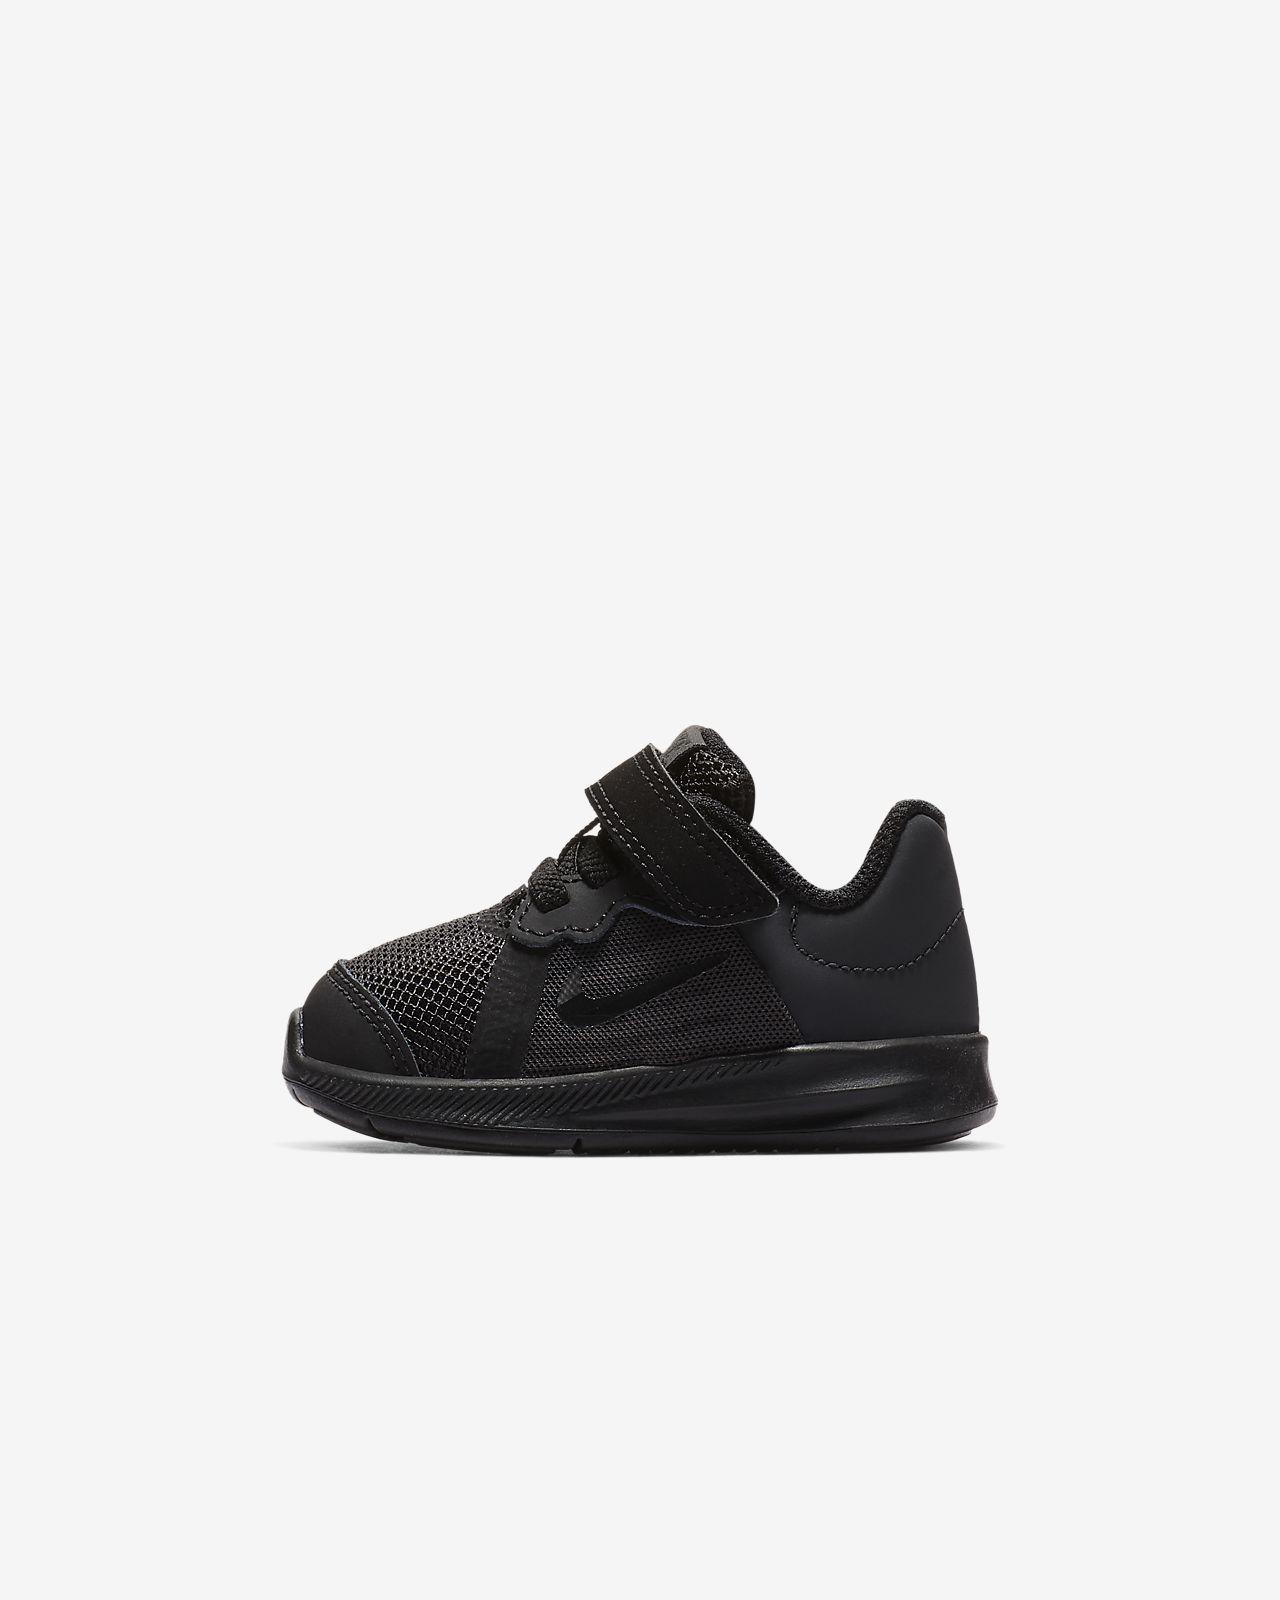 Кроссовки для малышей Nike Downshifter 8